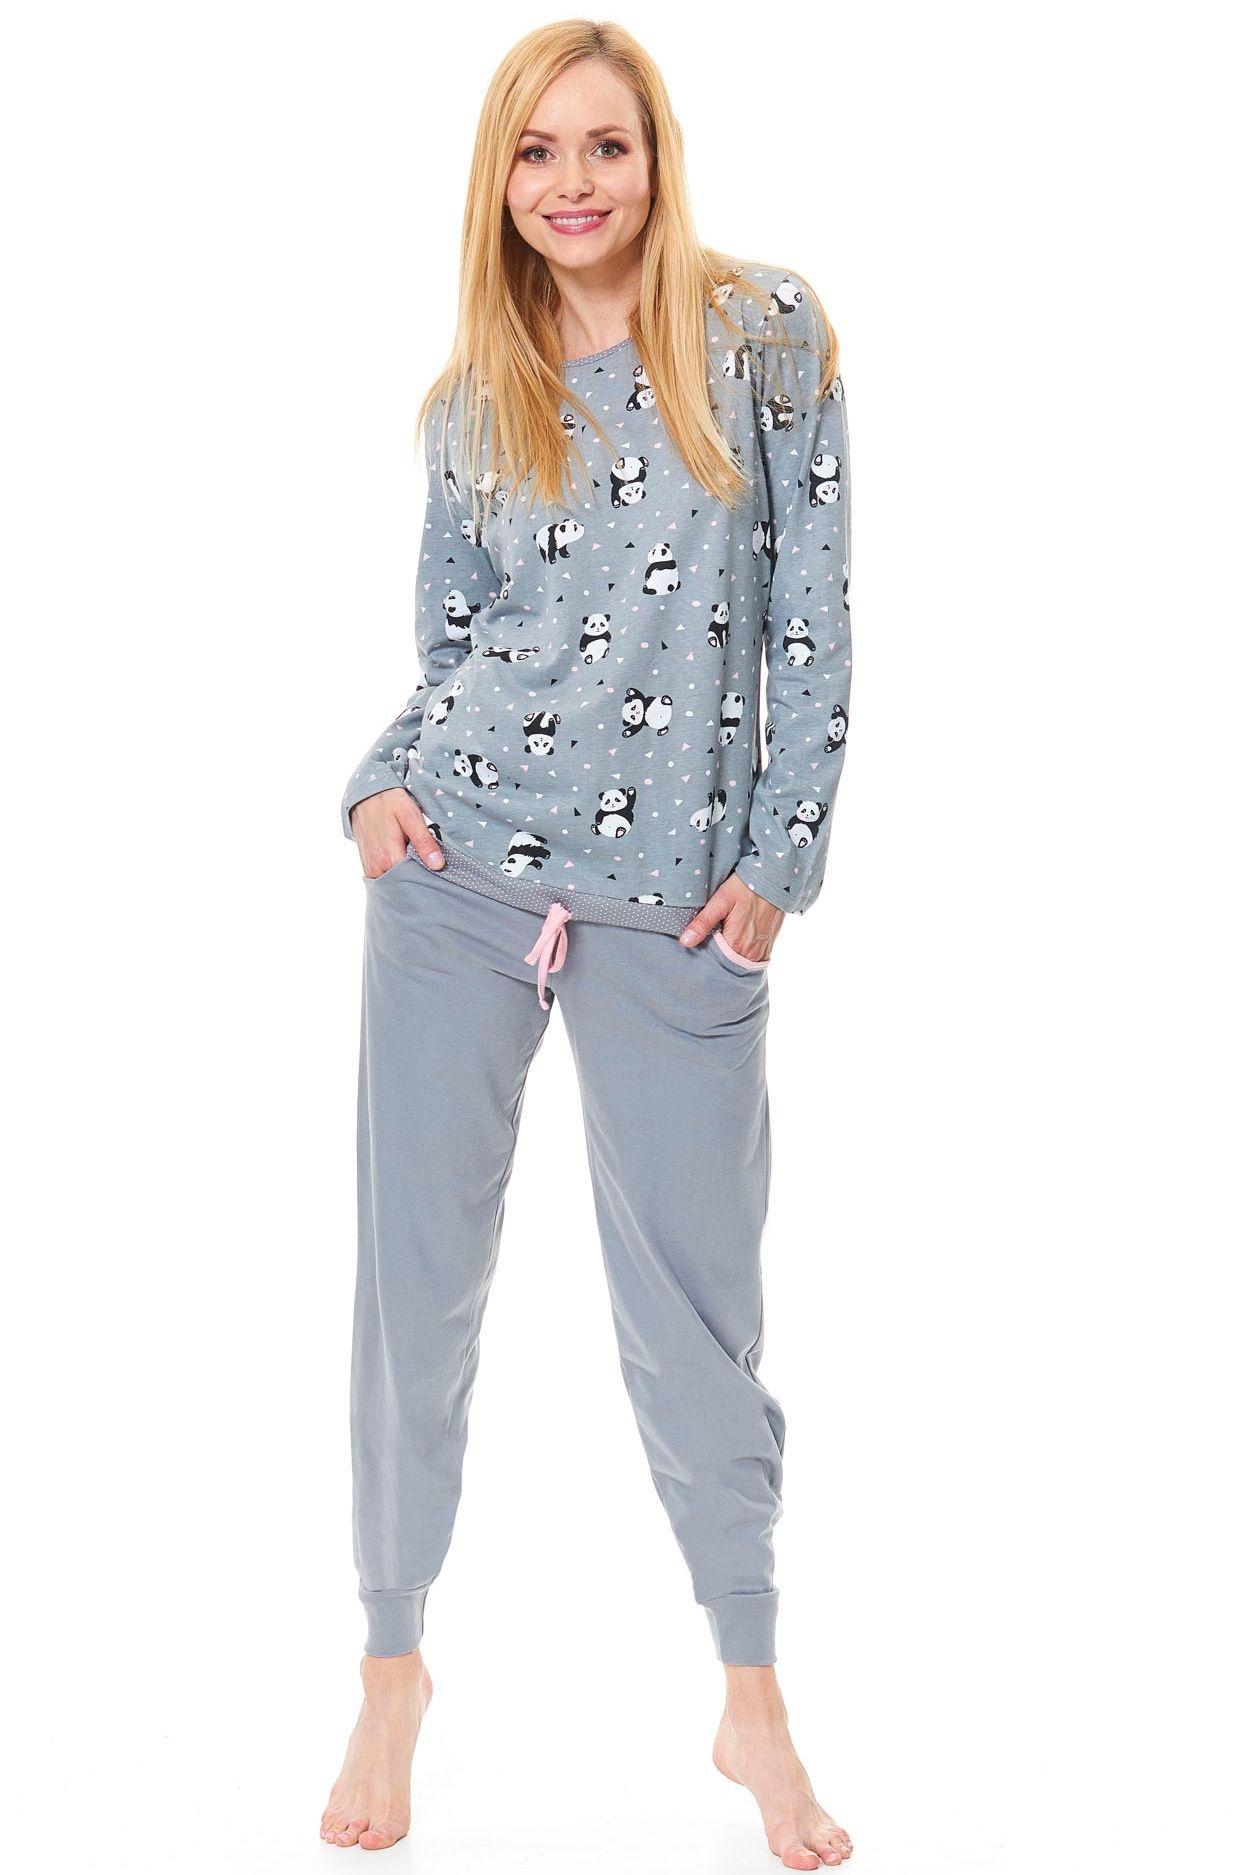 578c4182d627 Dámske bavlnené sivé pyžamo Funny panda - ELEGANT.sk